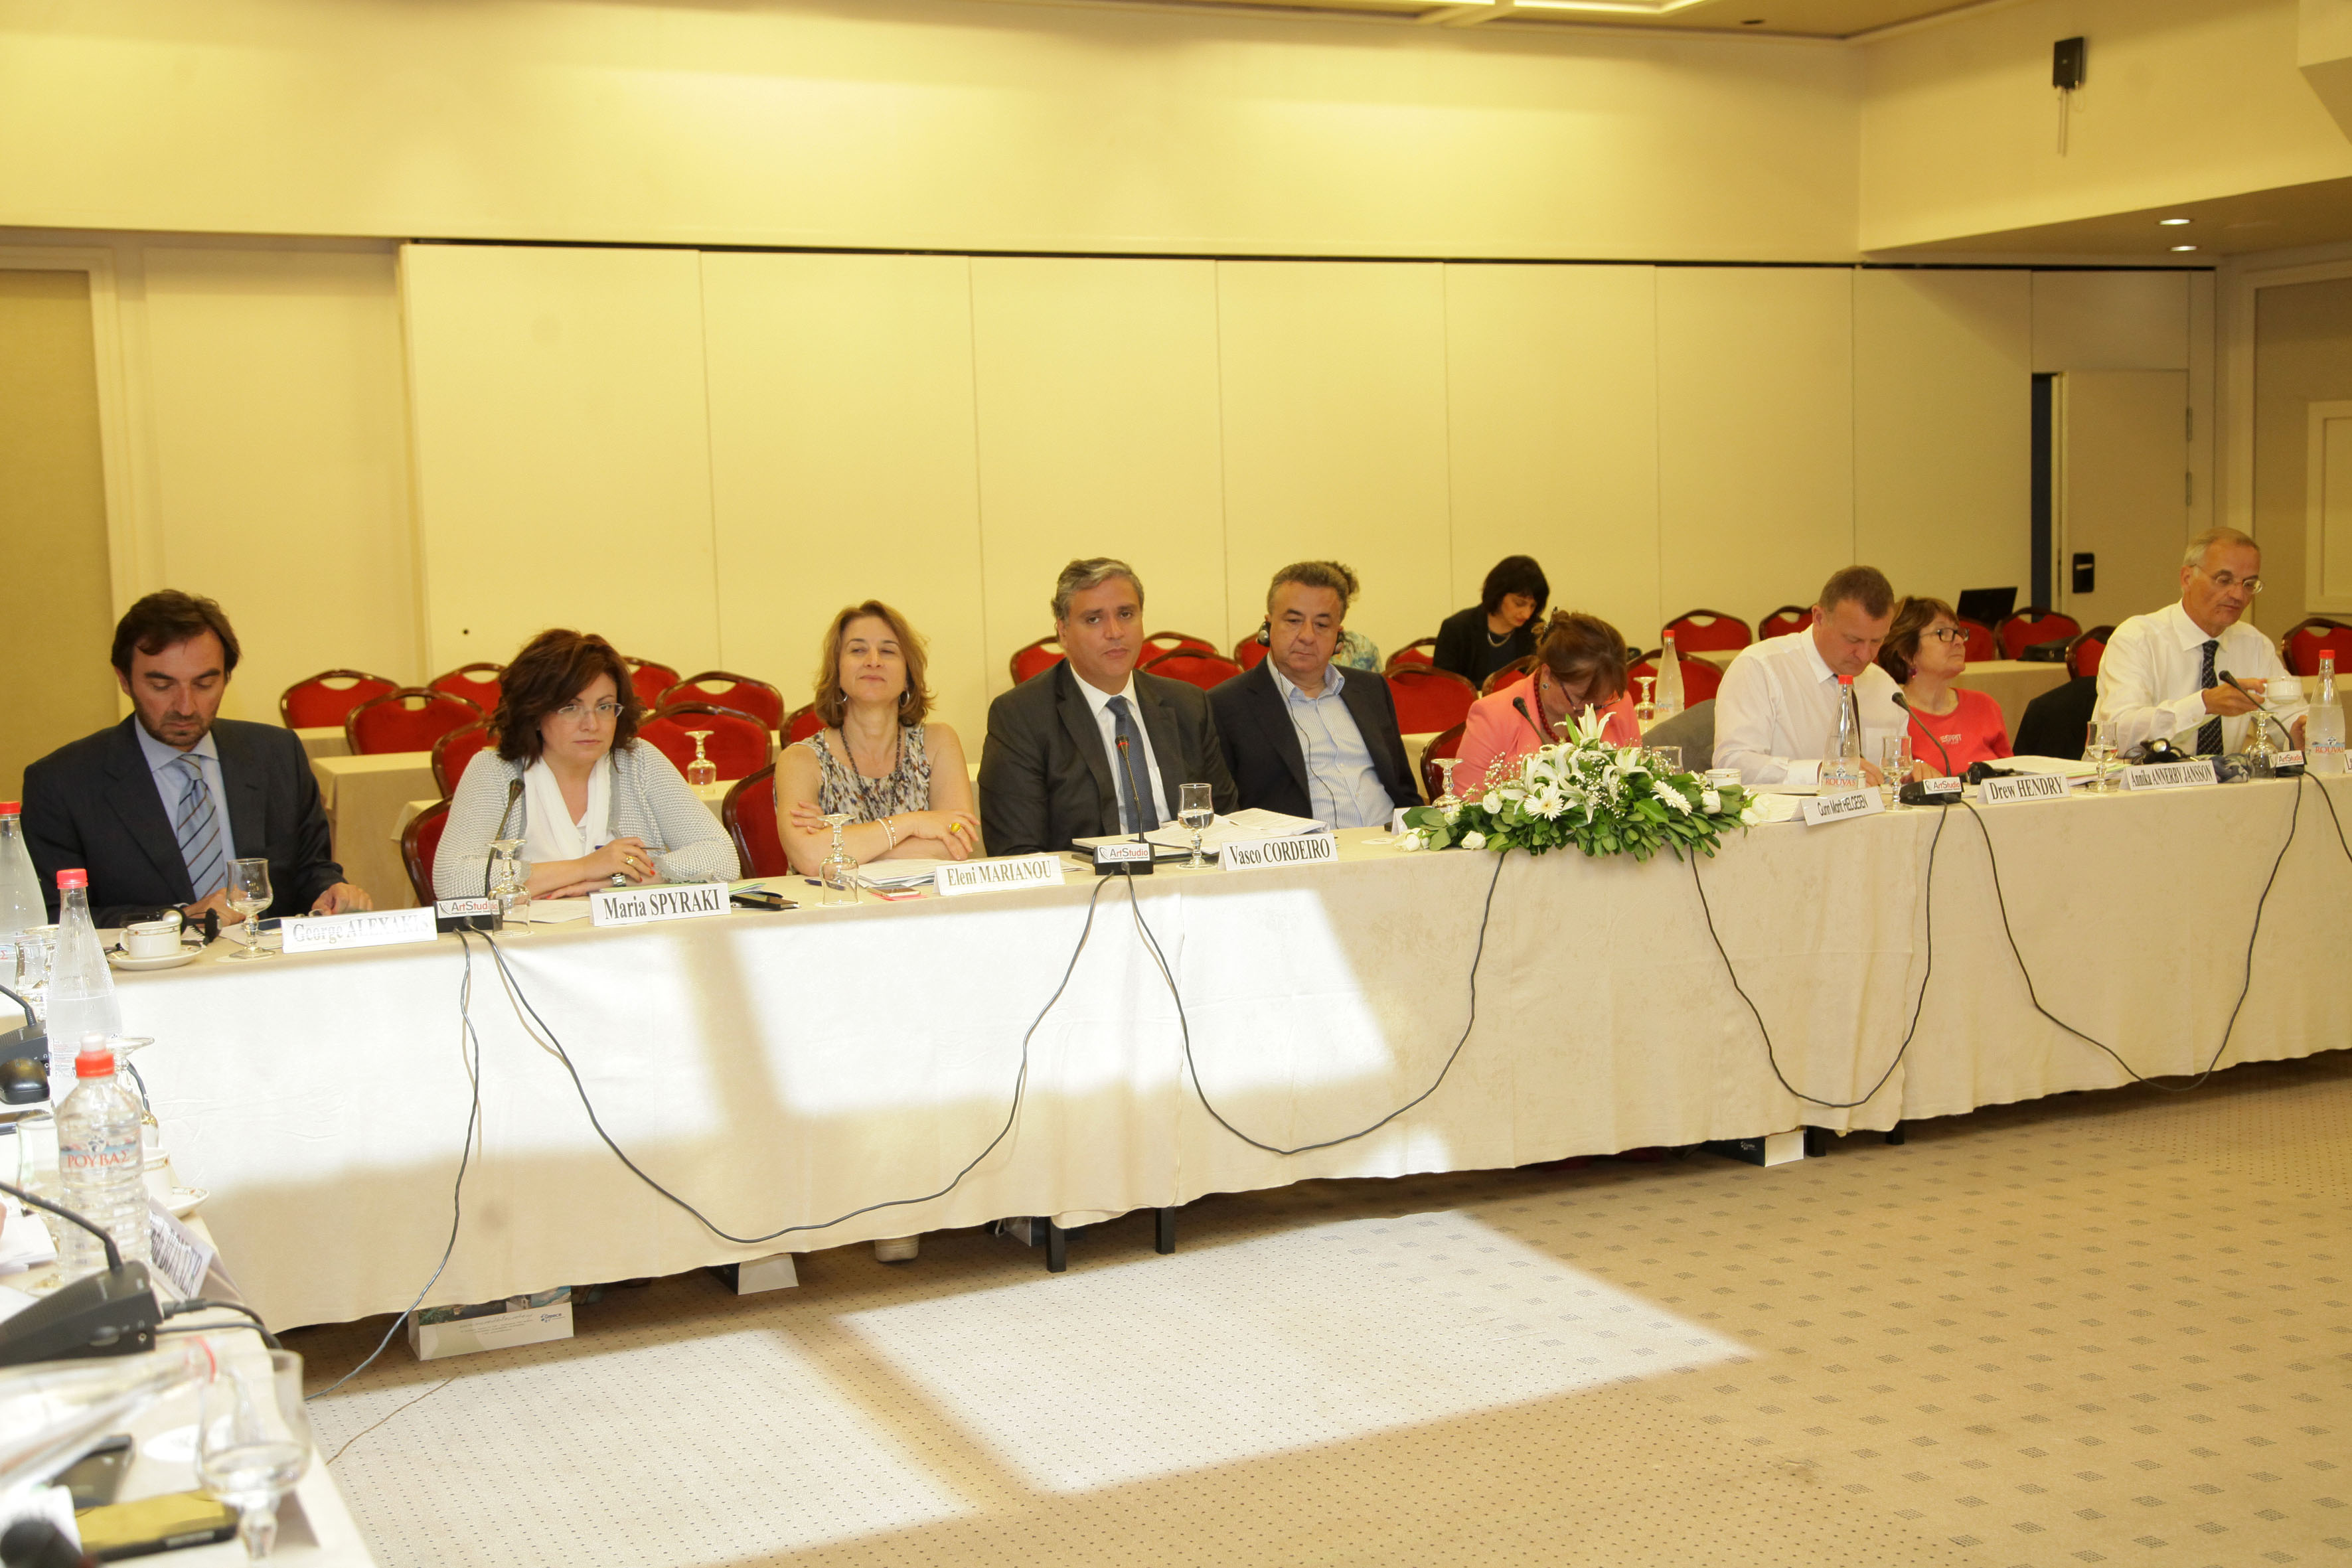 Eκδήλωση για την Πολιτική Συνοχής της Ε.Ε. που διοργάνωσε η Περιφέρεια Κρήτης